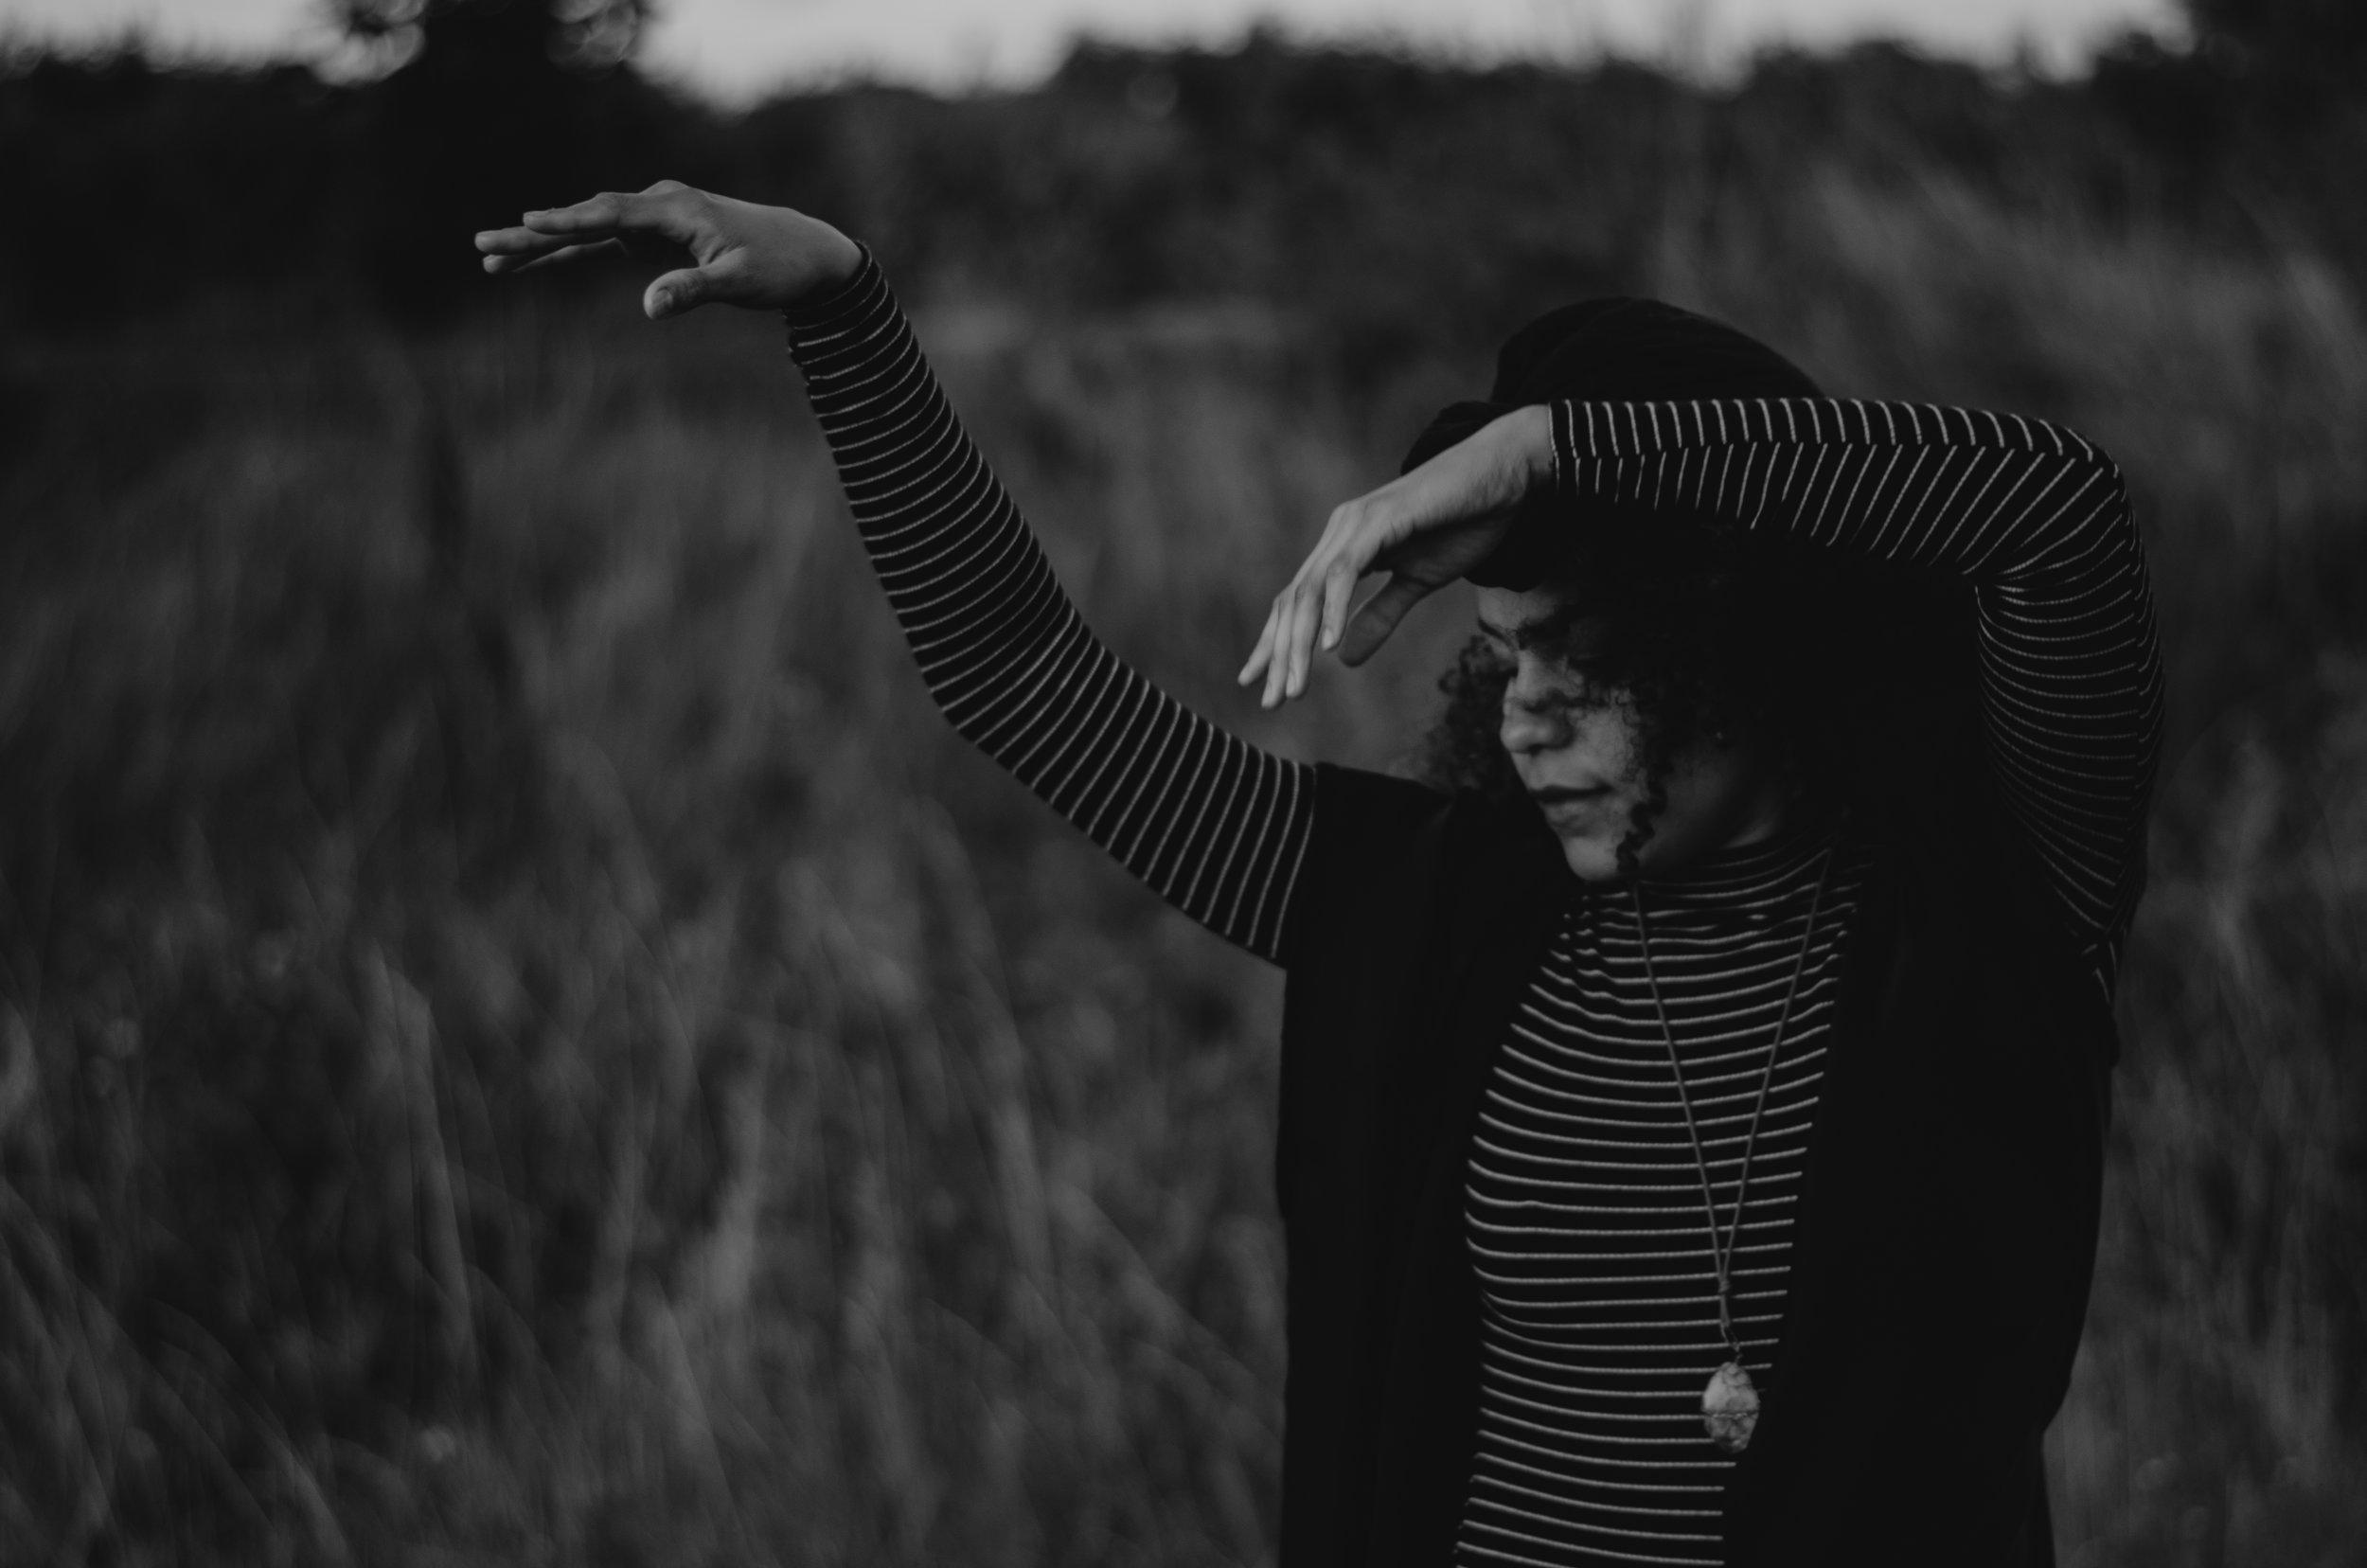 Inka-Portrait-Session-Aiste-Saulyte-Photography-17-07-30-552.jpg